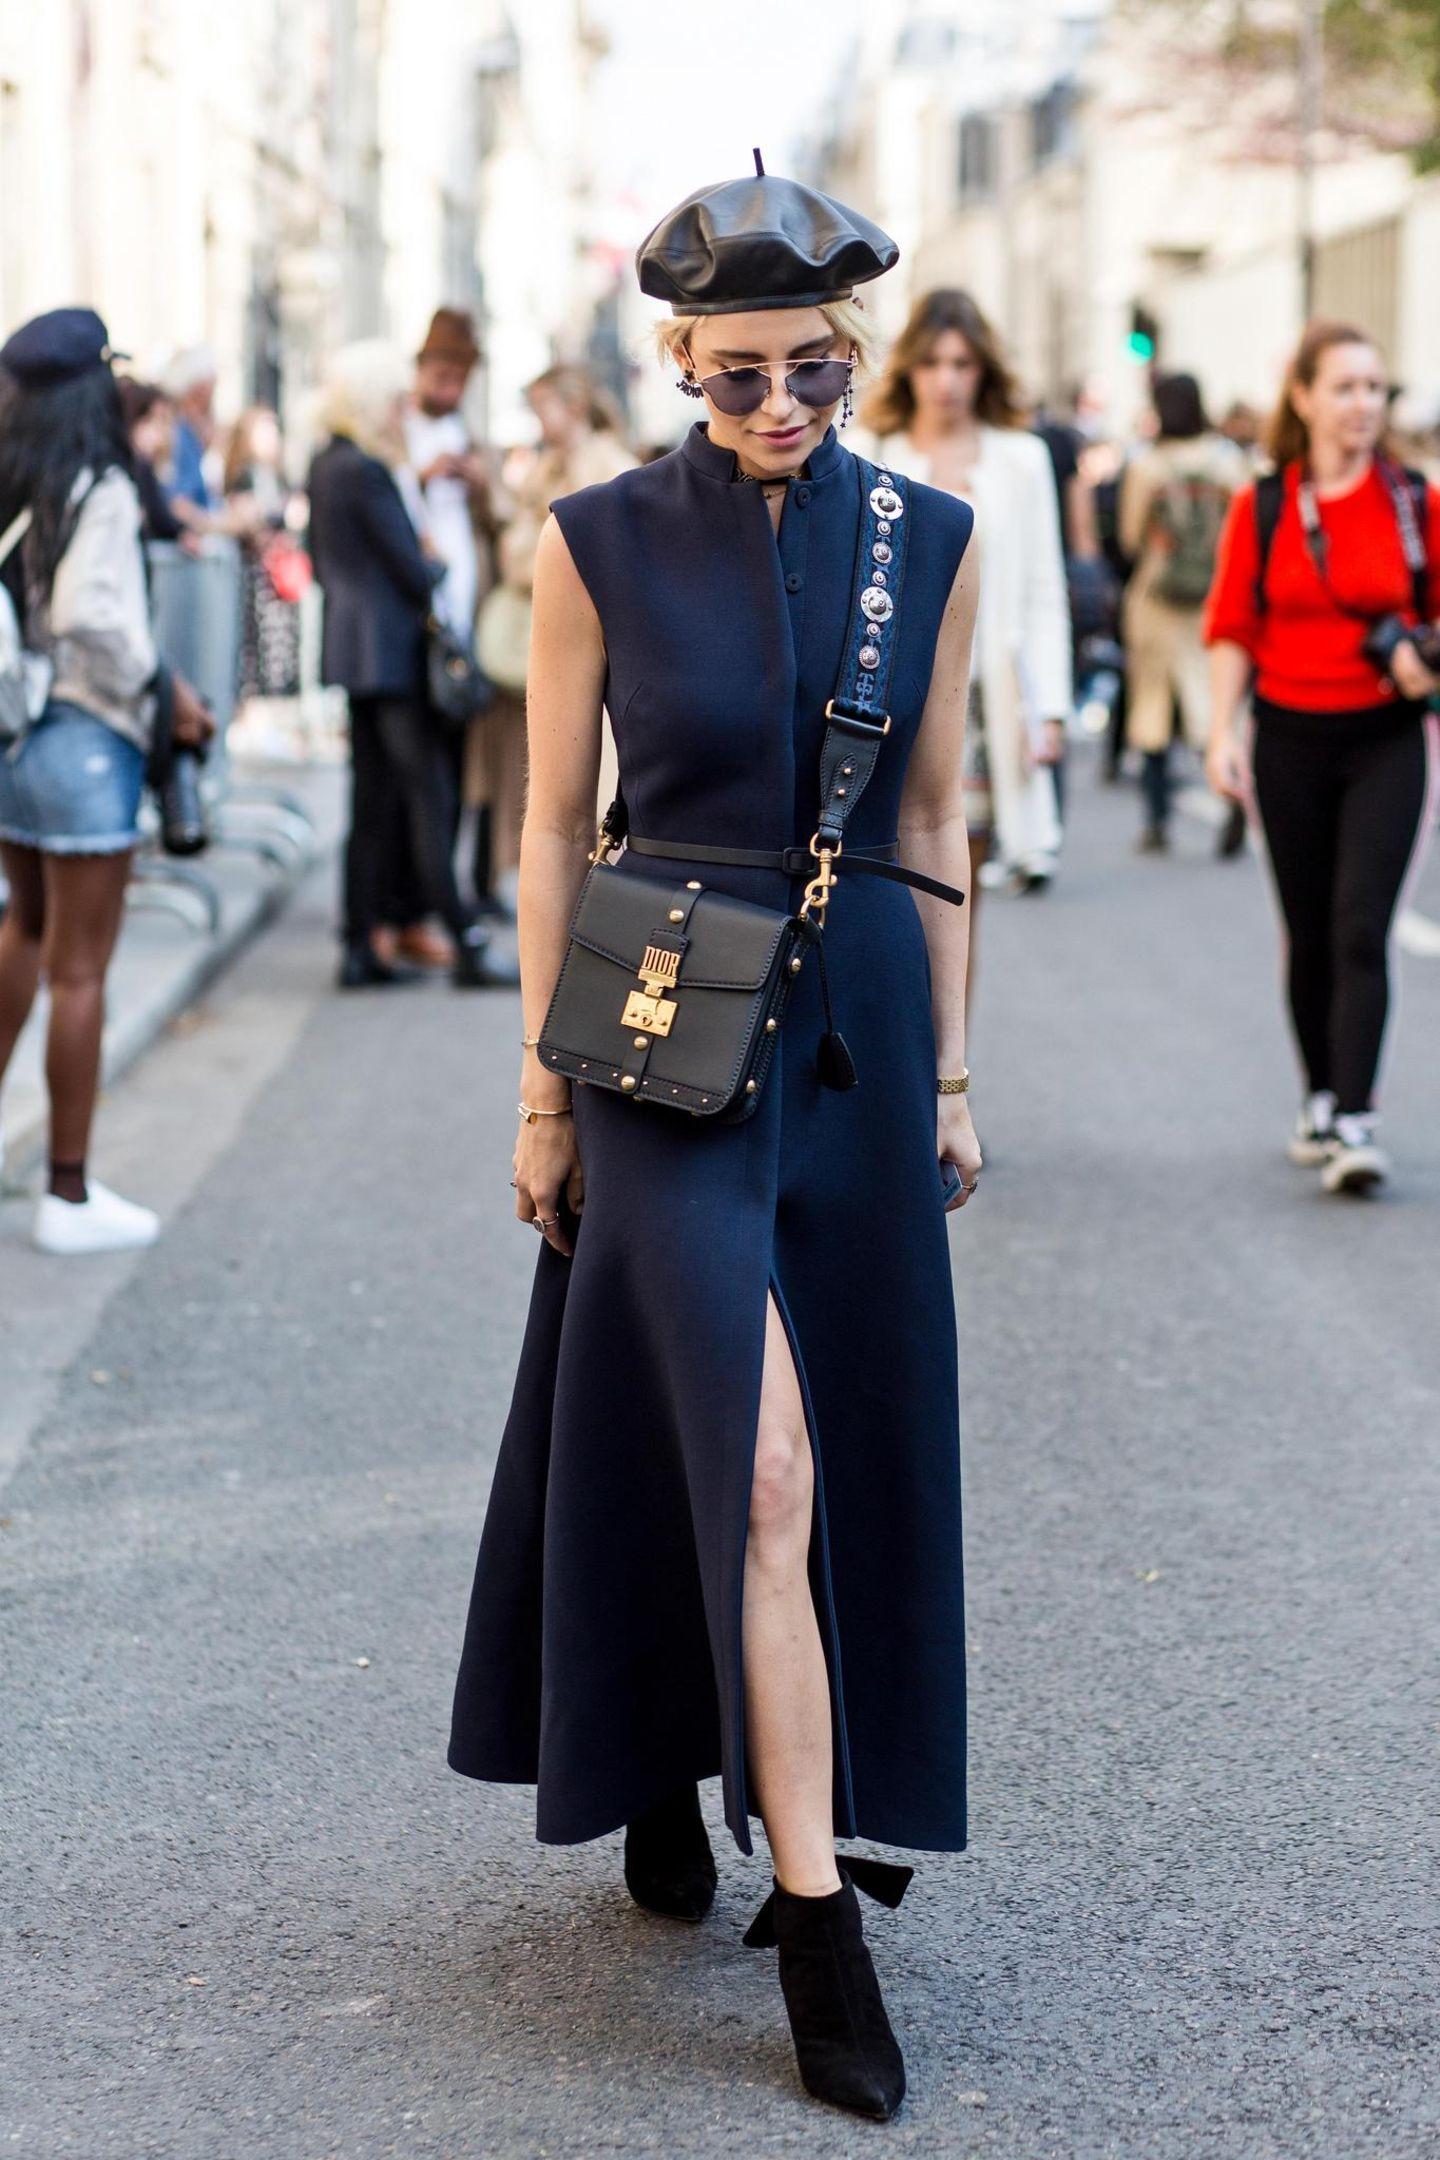 Sommer-Streetstyles: Ärmelloses Button Down Dress mit passenden Accessoires